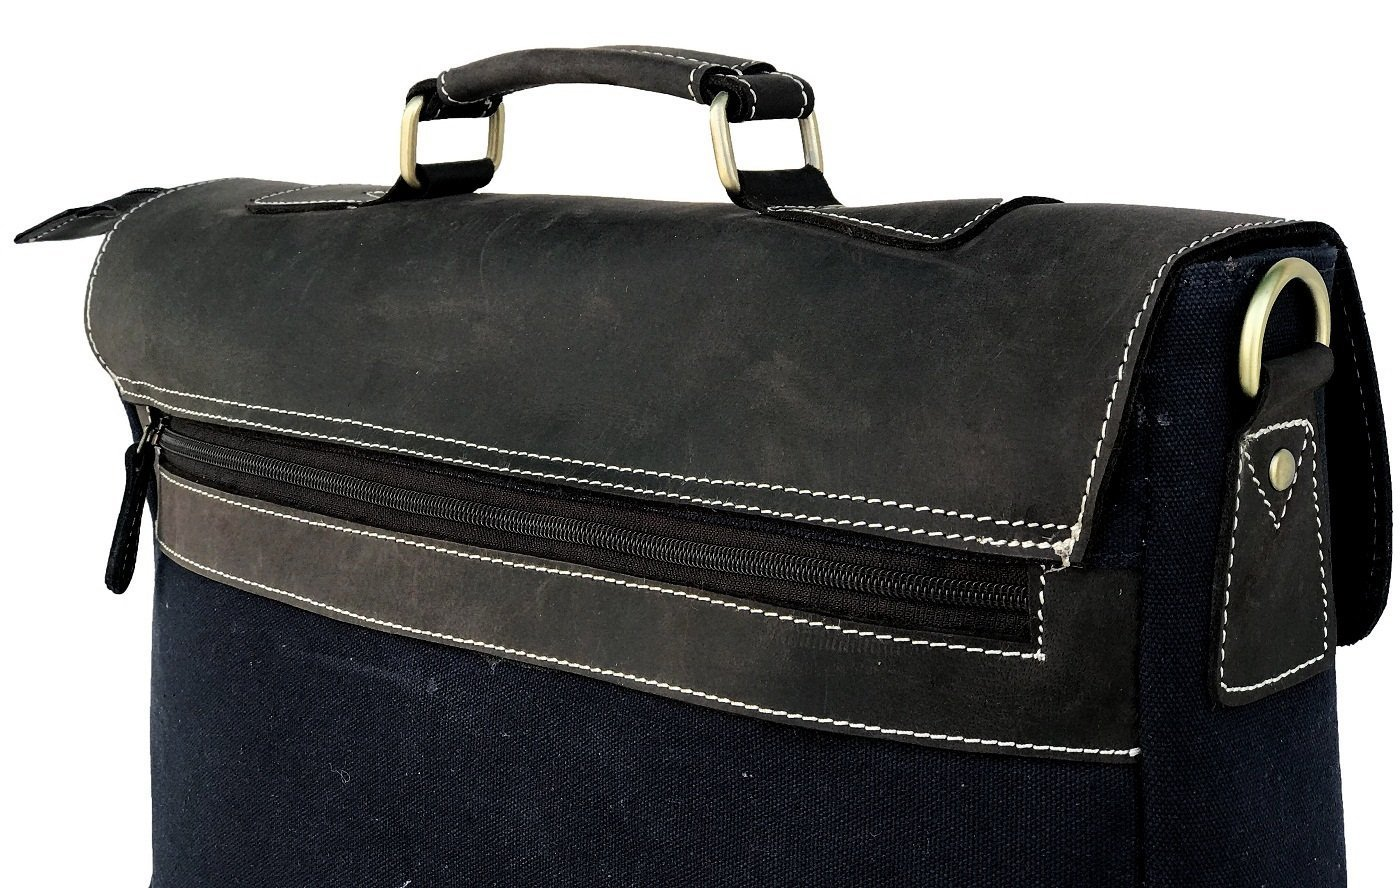 Breifcase Yellow Canvas And Black Buffalo Leather Bag Prastara Handicrafts 16x12inch